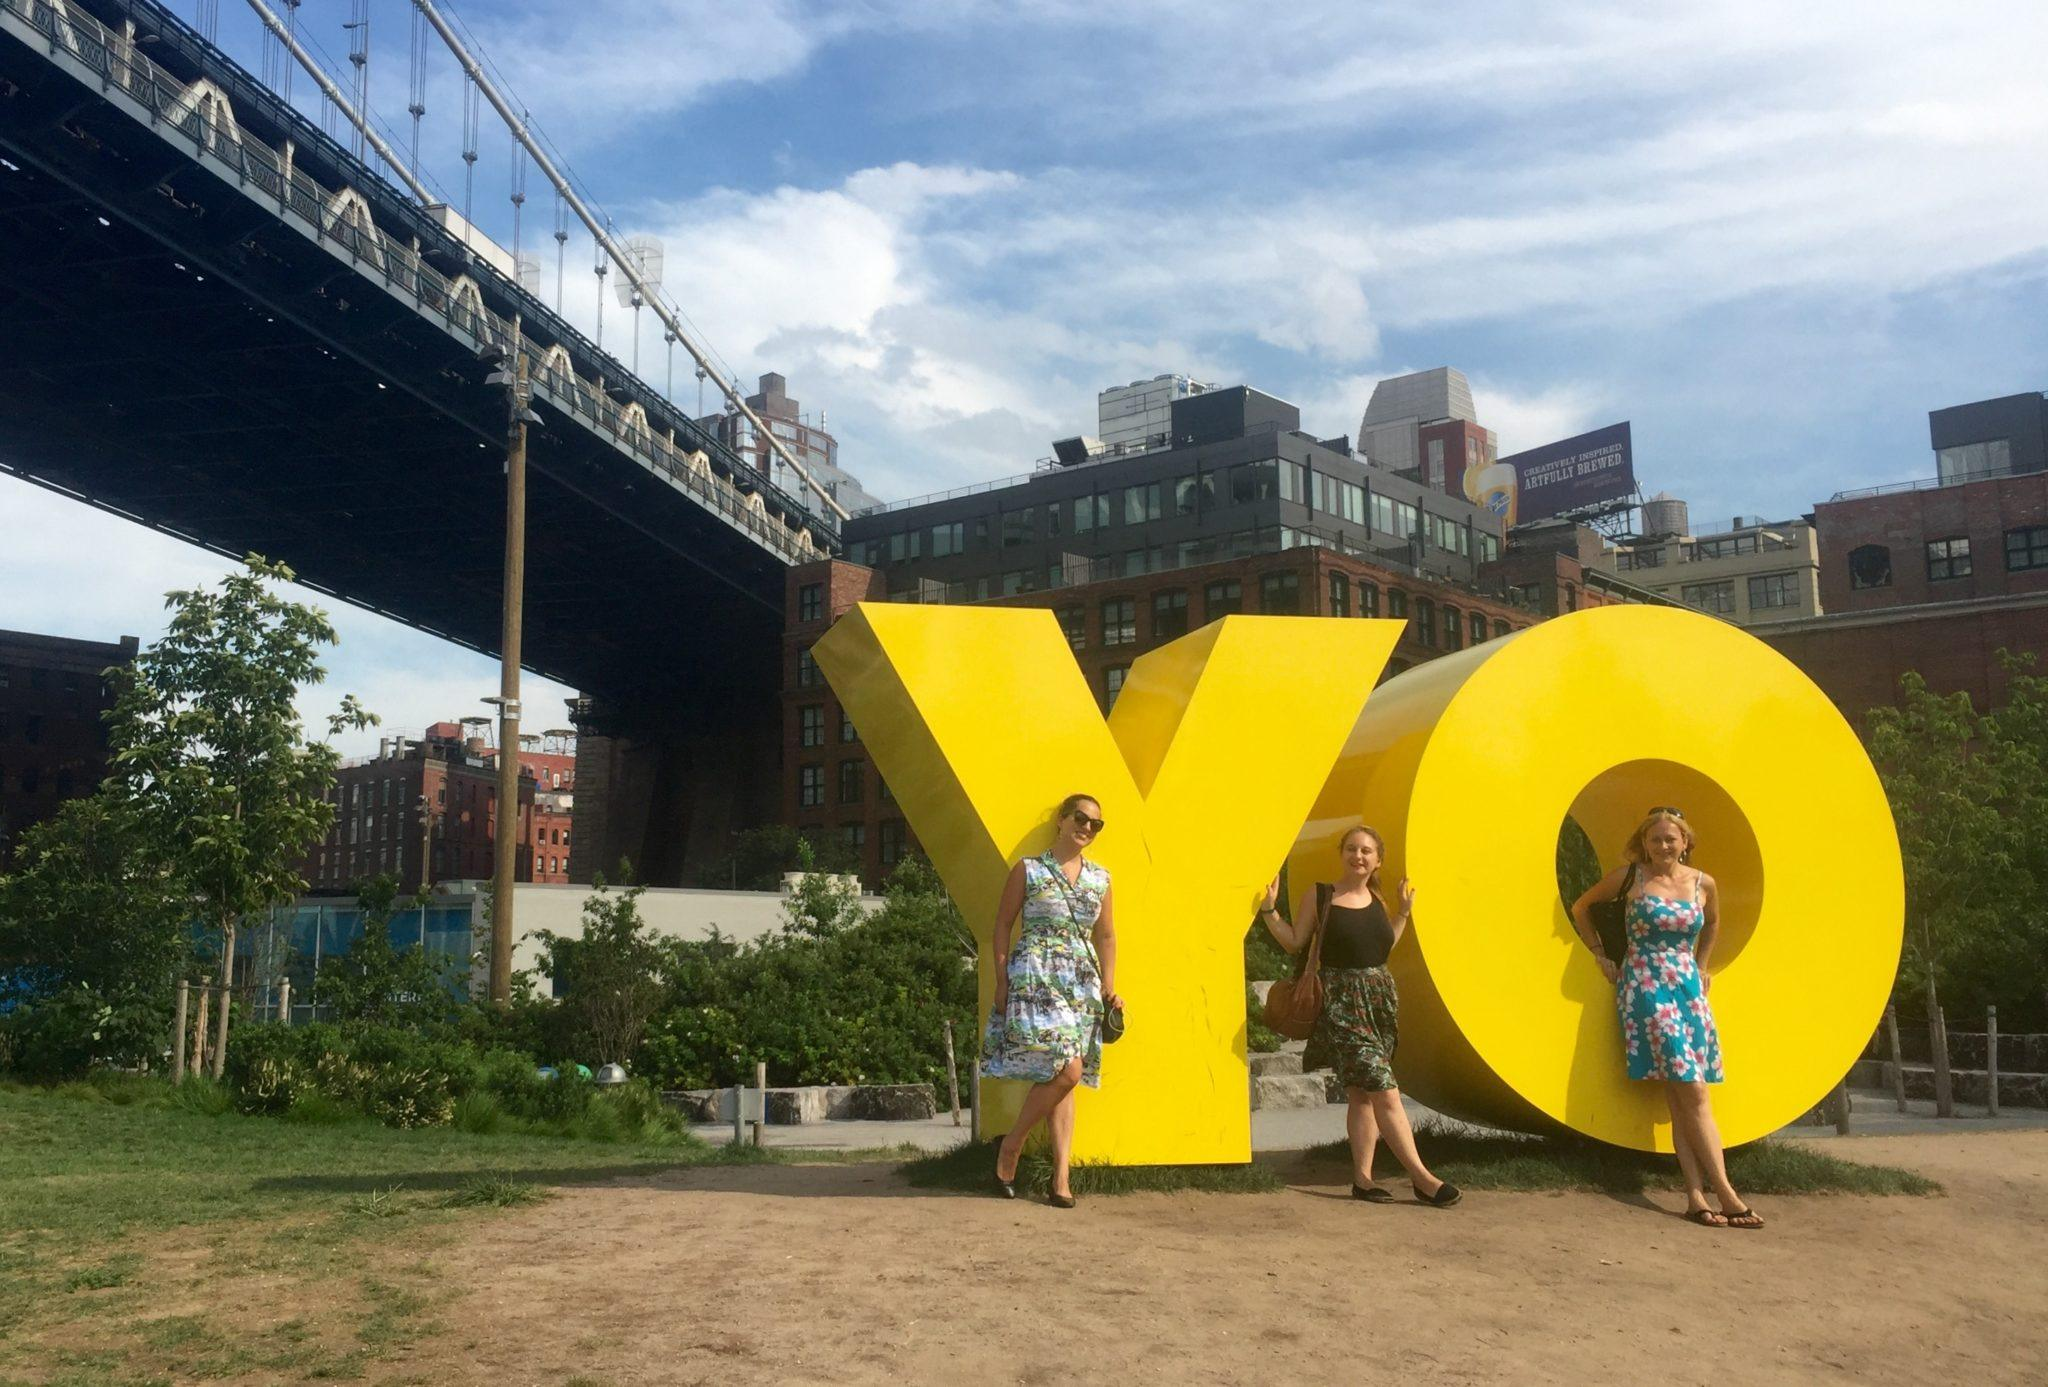 YO in Brooklyn Bridge Park